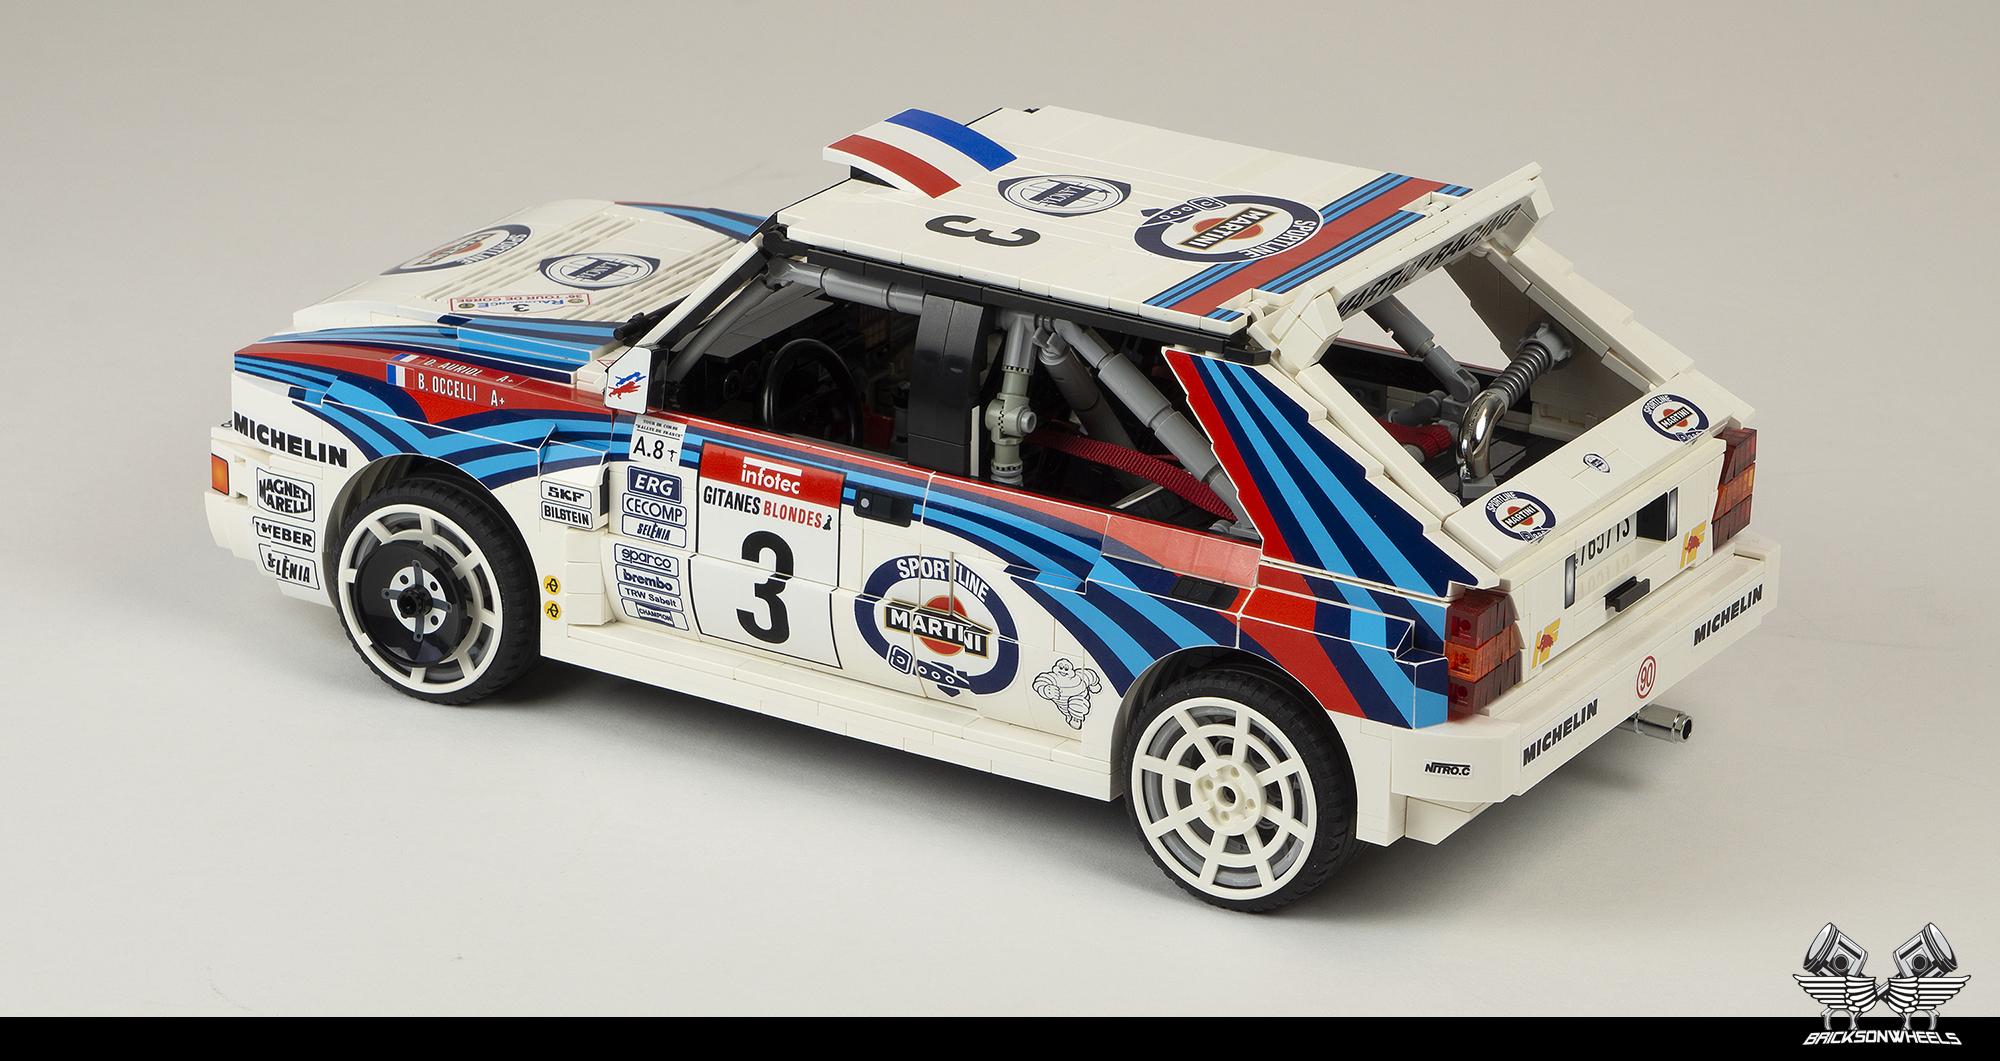 Lancia Delta HF Integrale EVO - 1992 Tour de Corse